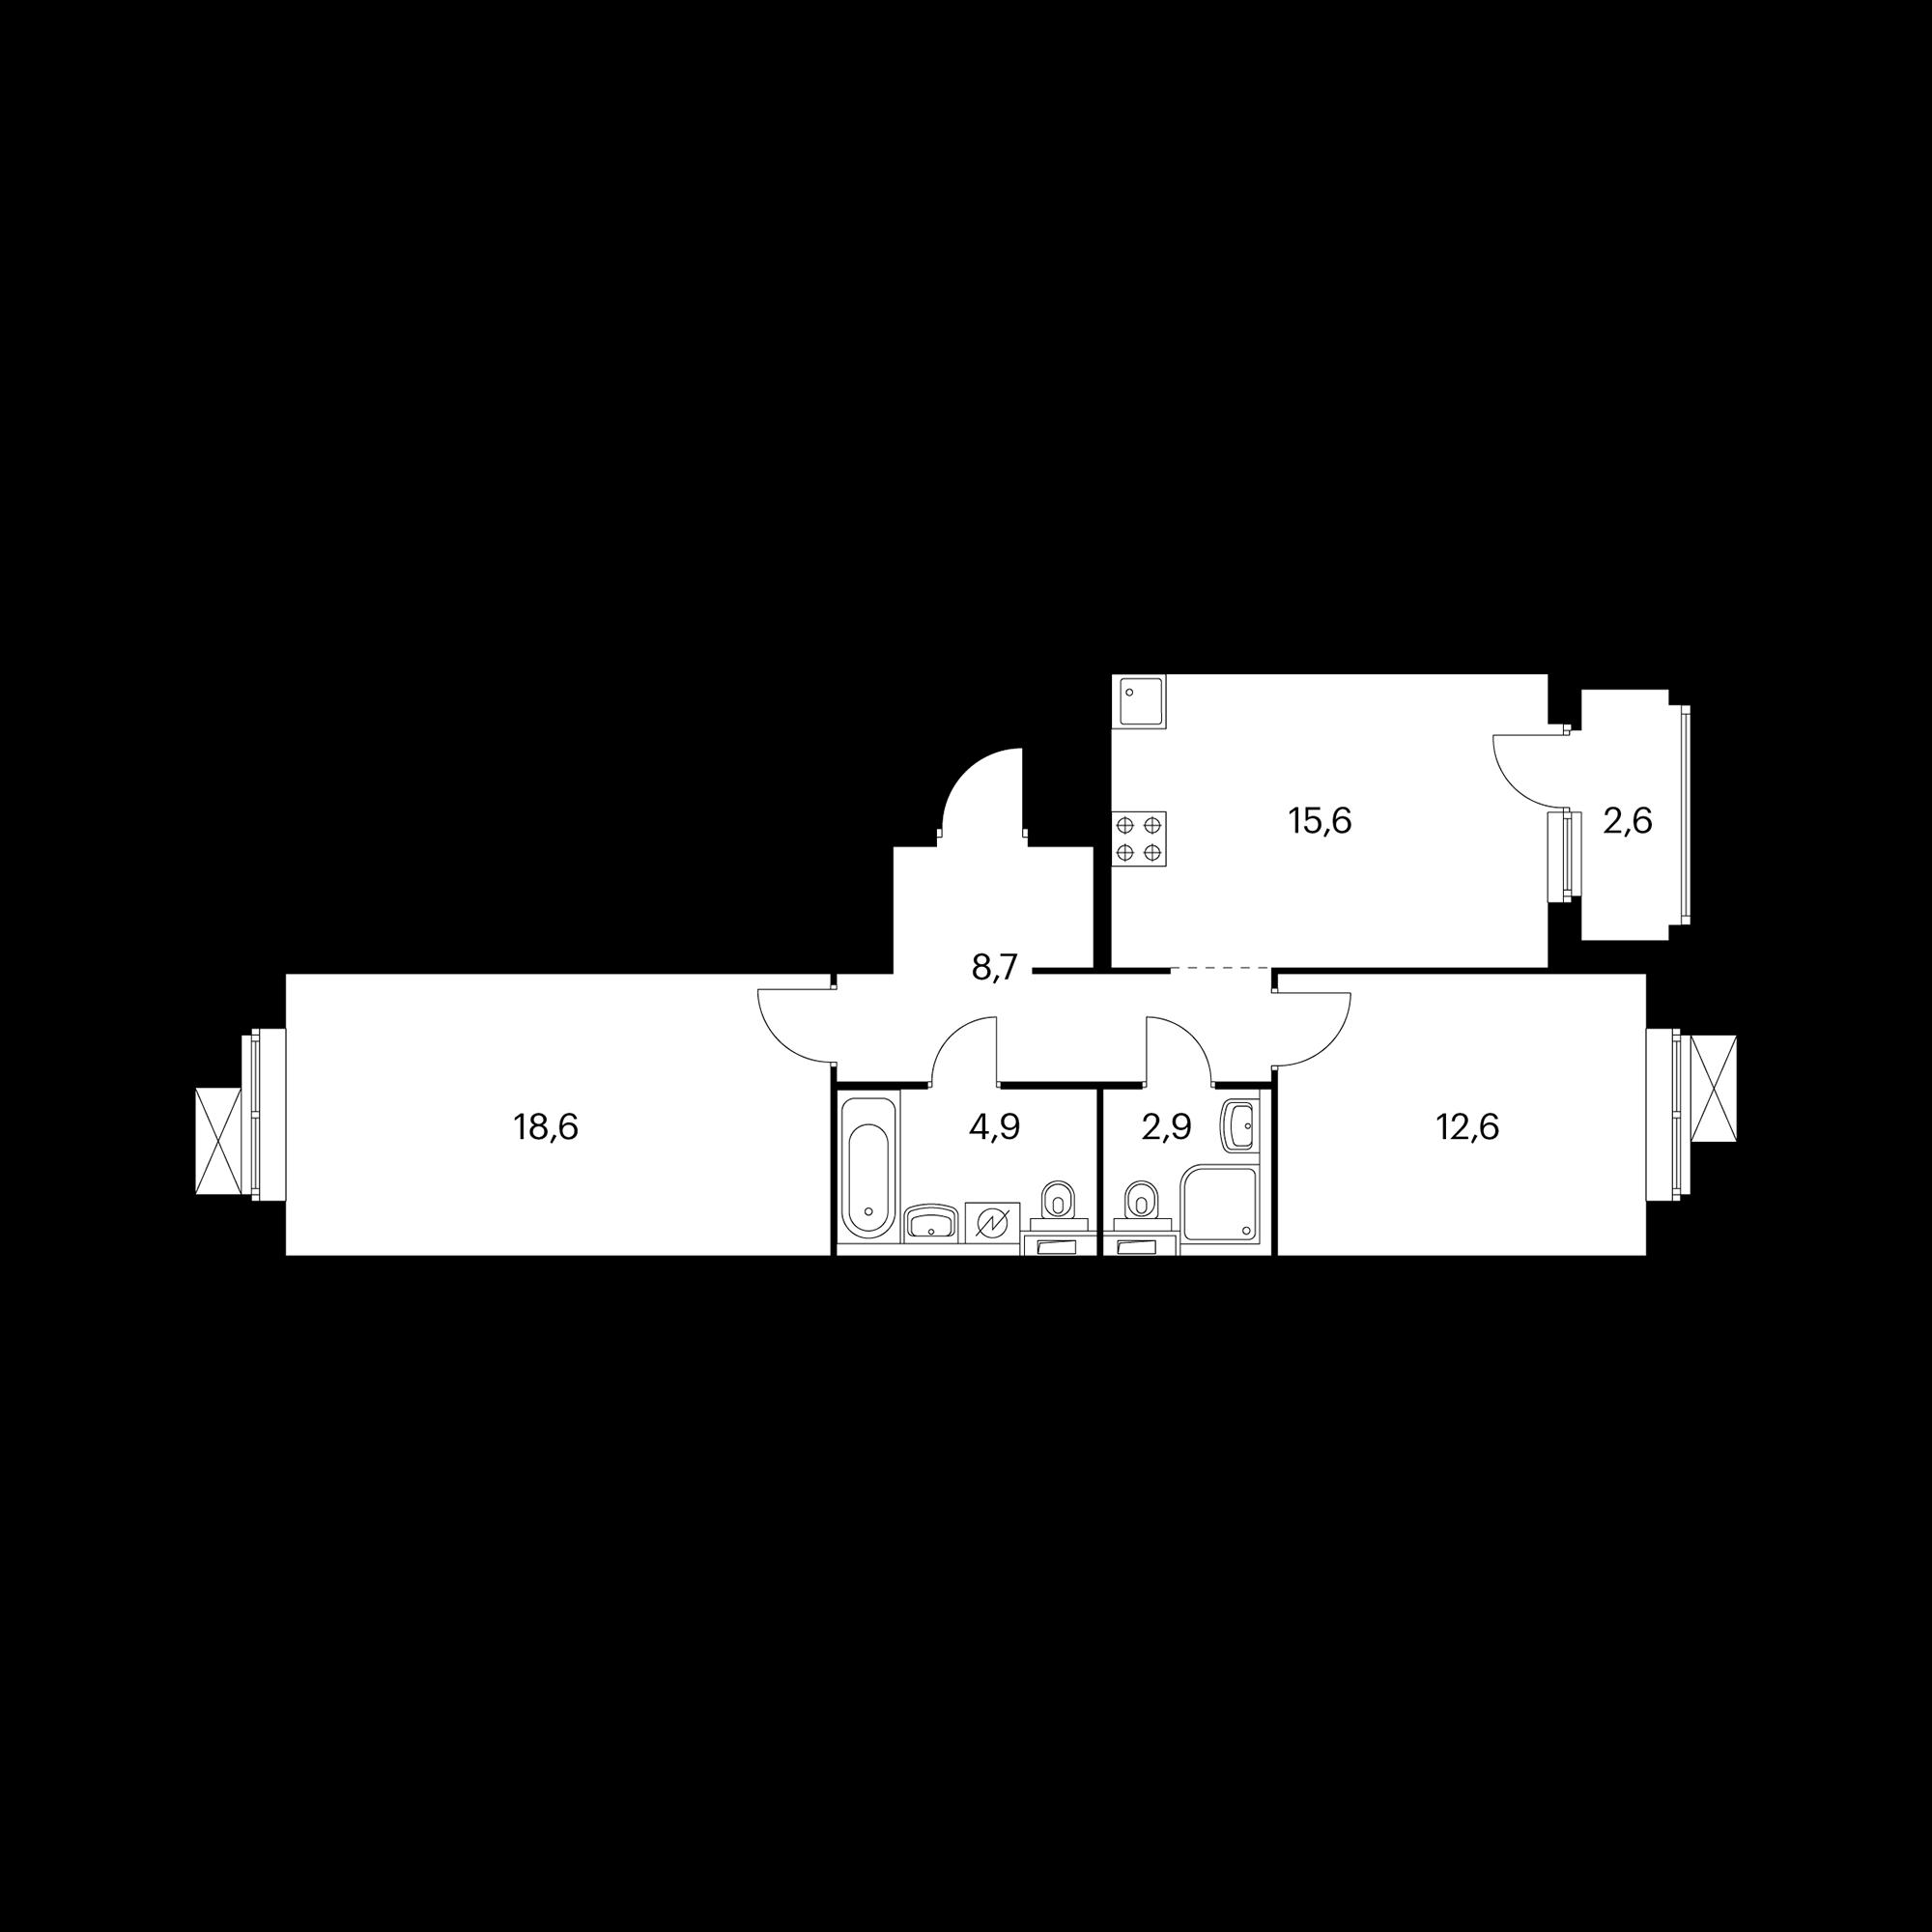 2EL3_6.6-2